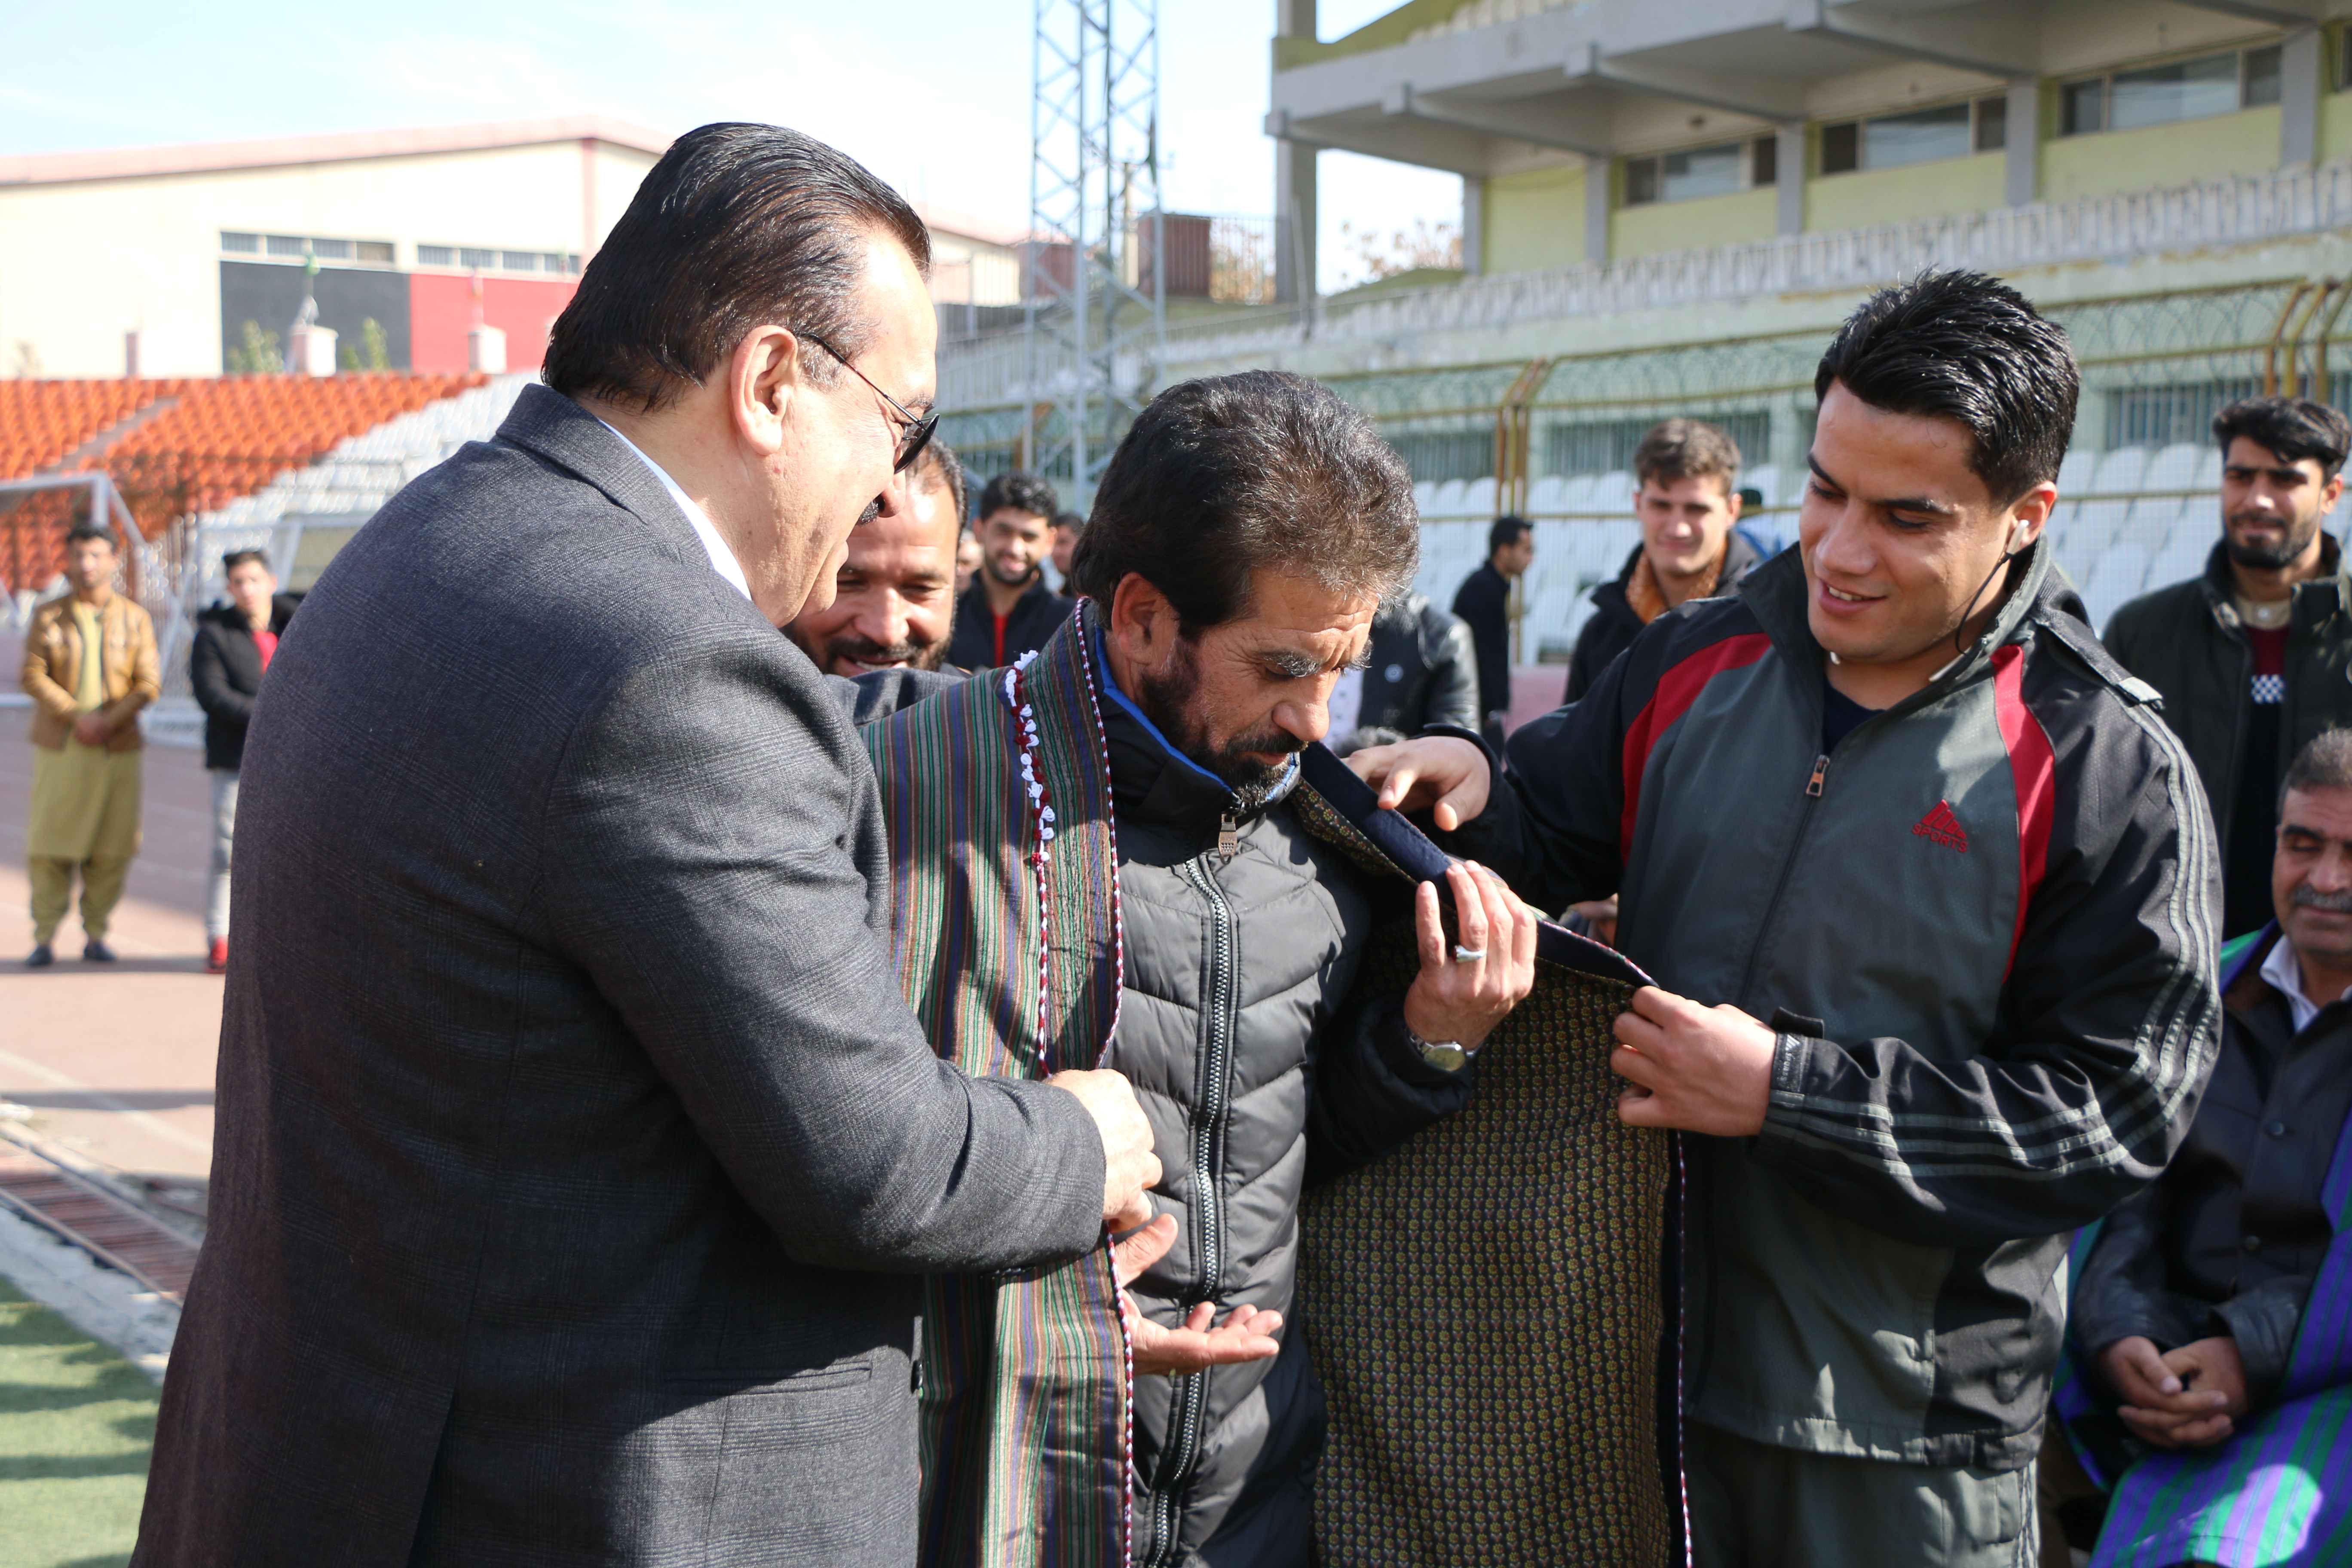 تیم مشعل قهرمان لیگ قهرمانان کابل شد